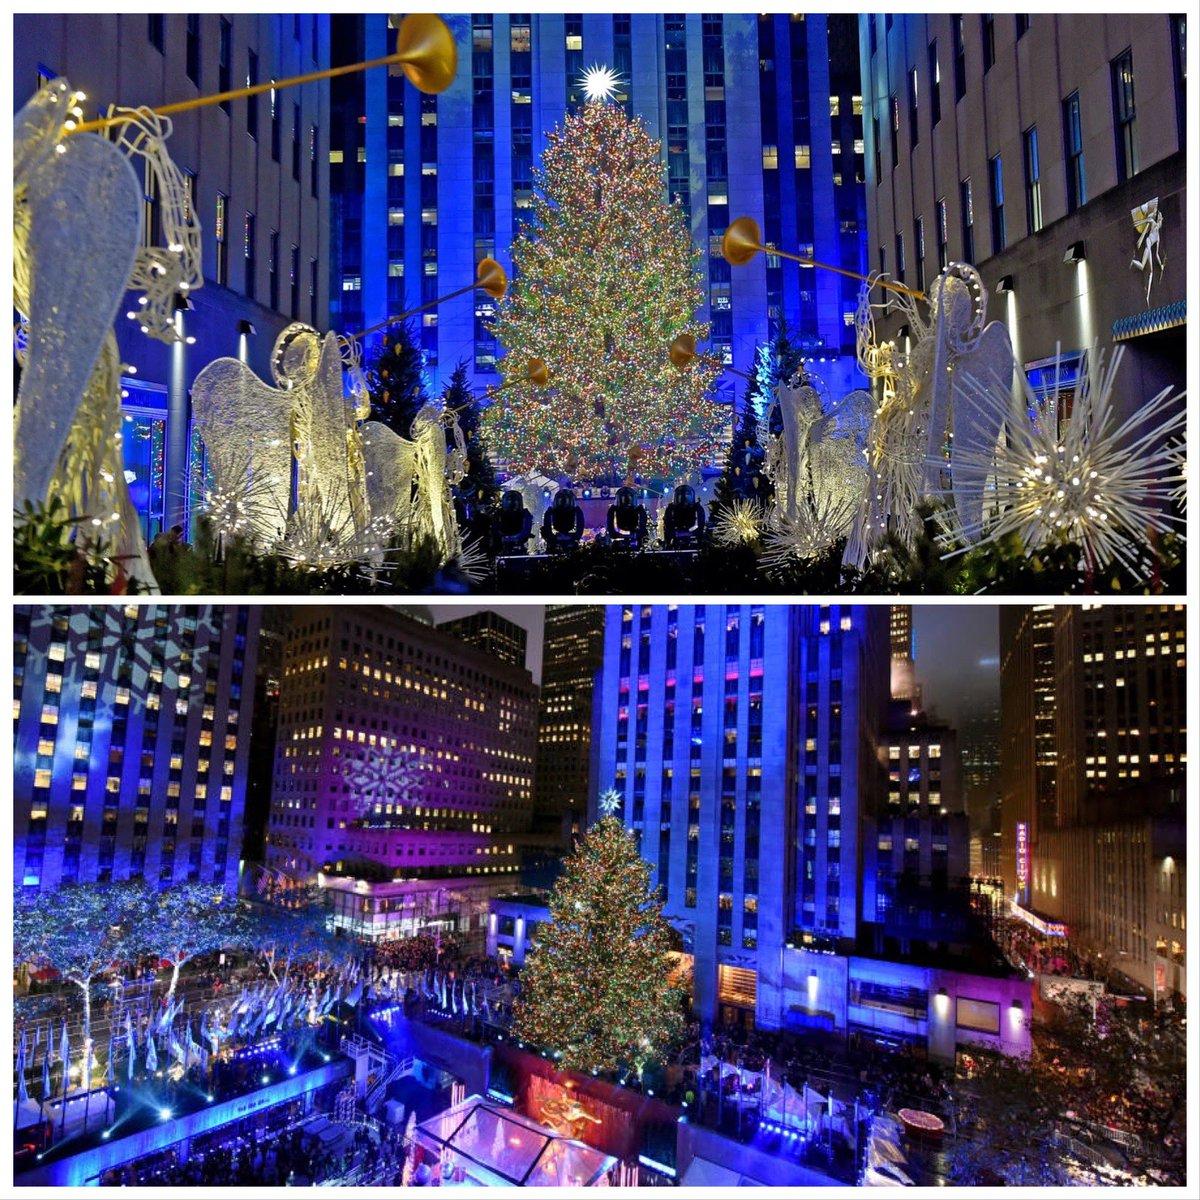 The Iconic Rockefeller Center Christmas tree is lit.. #Itsbeginningtolookalotlikechristmas #RockCenterXMAS #RockefellerChristmasTree #rockefellerchristmastreelighting2020🌲